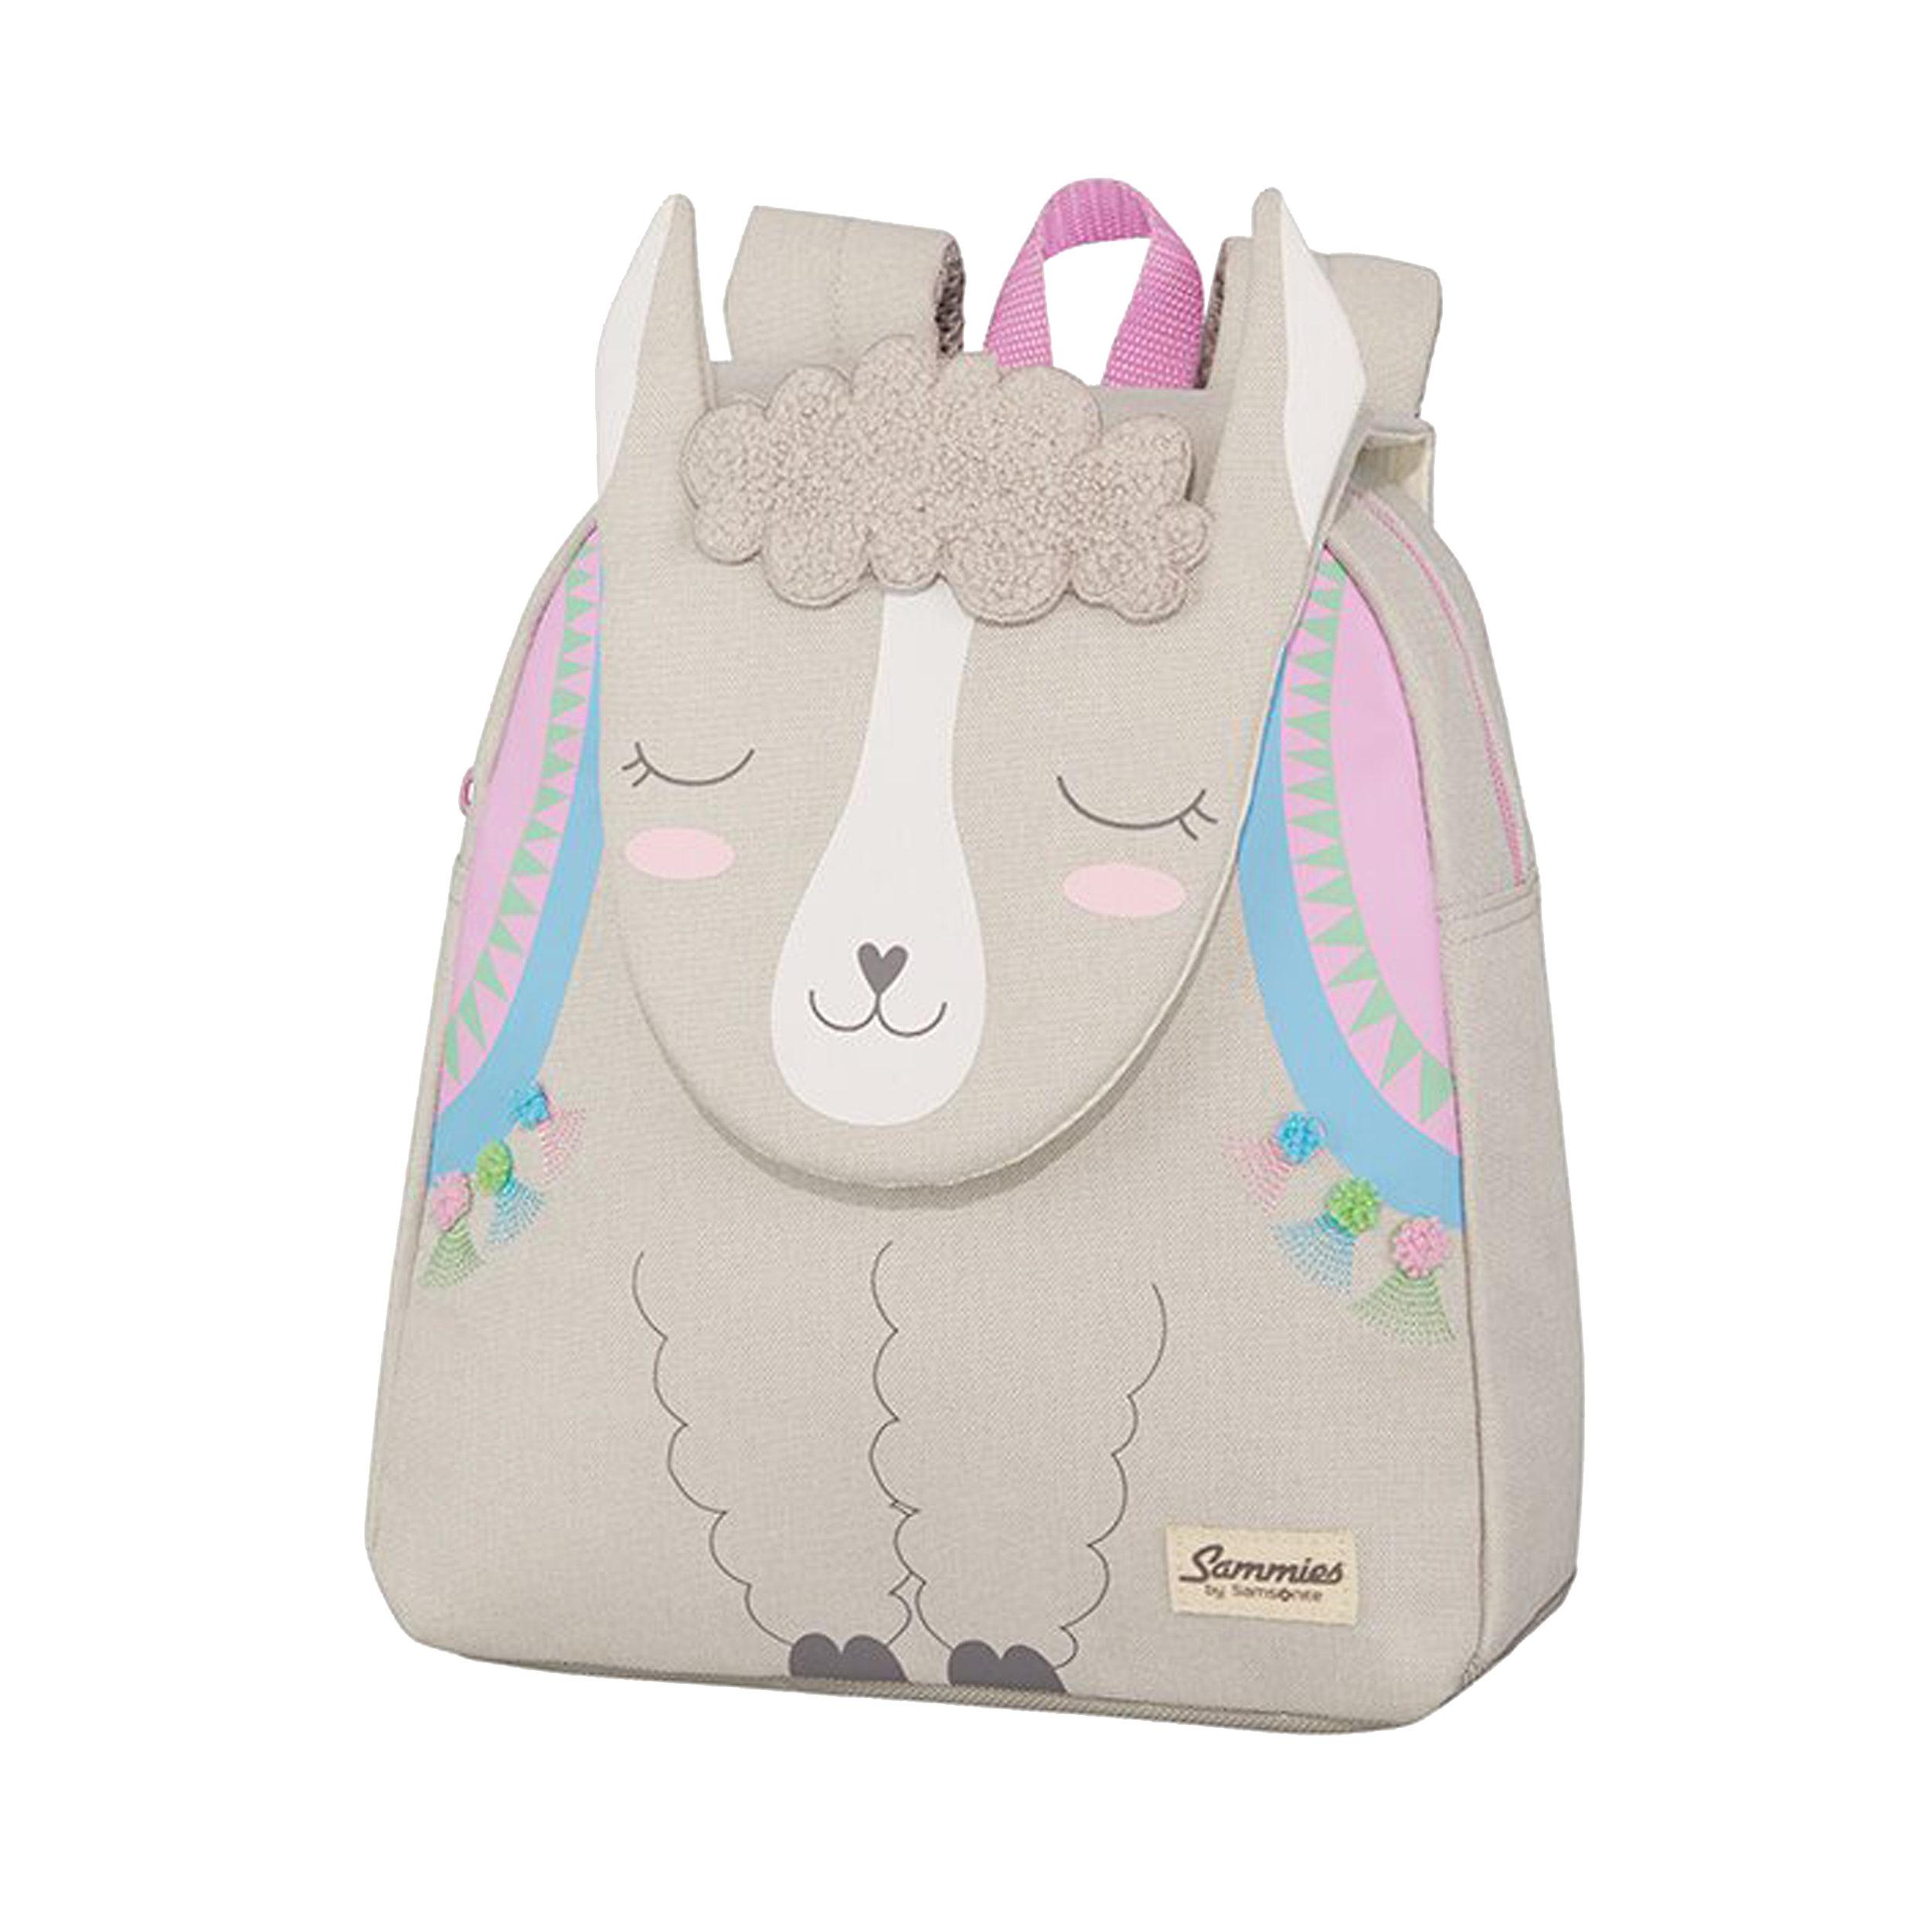 Kinderrucksack S Alpaca Aubrie Happy Sammies 7 Liter